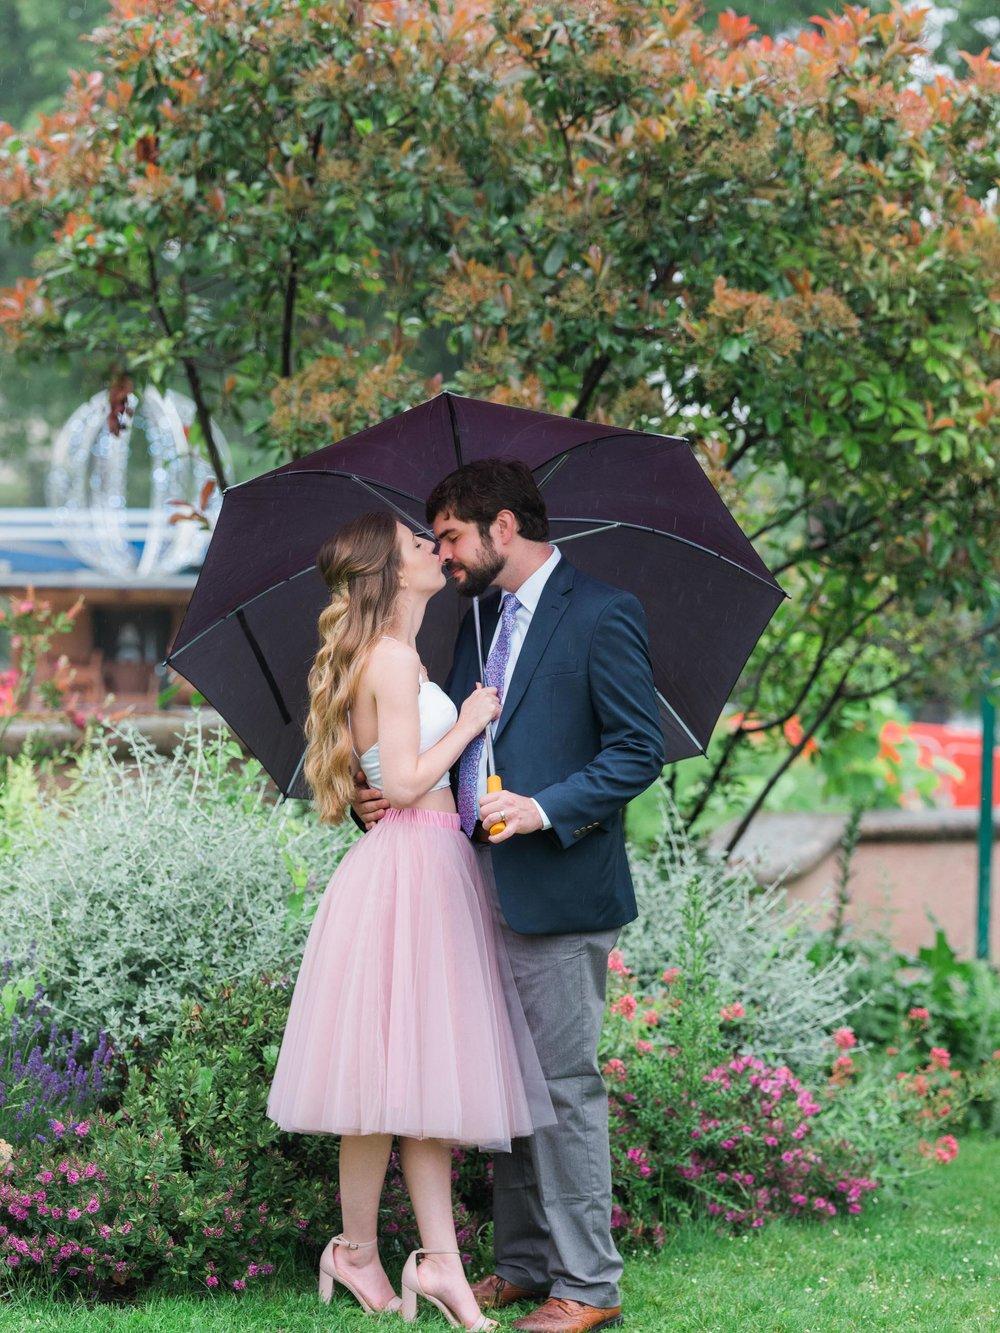 romantic rainy eiffel tower trocadero honeymoon photo shoot in paris france